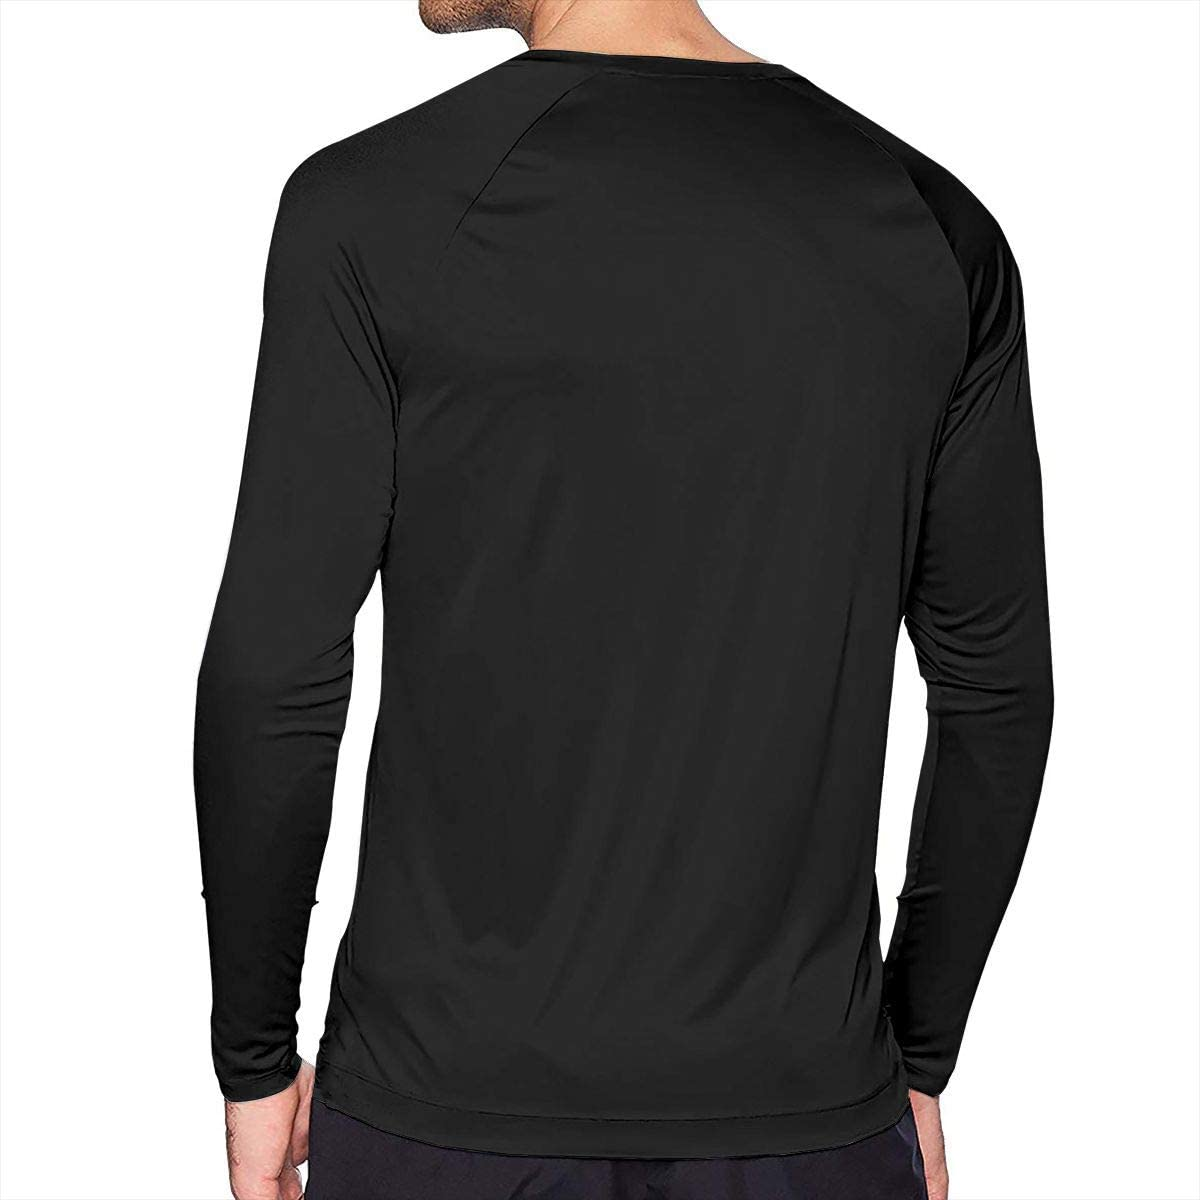 AIDANHAR Personalized Skull La Calavera Catrina Crew-Neck T-Shirt for Man